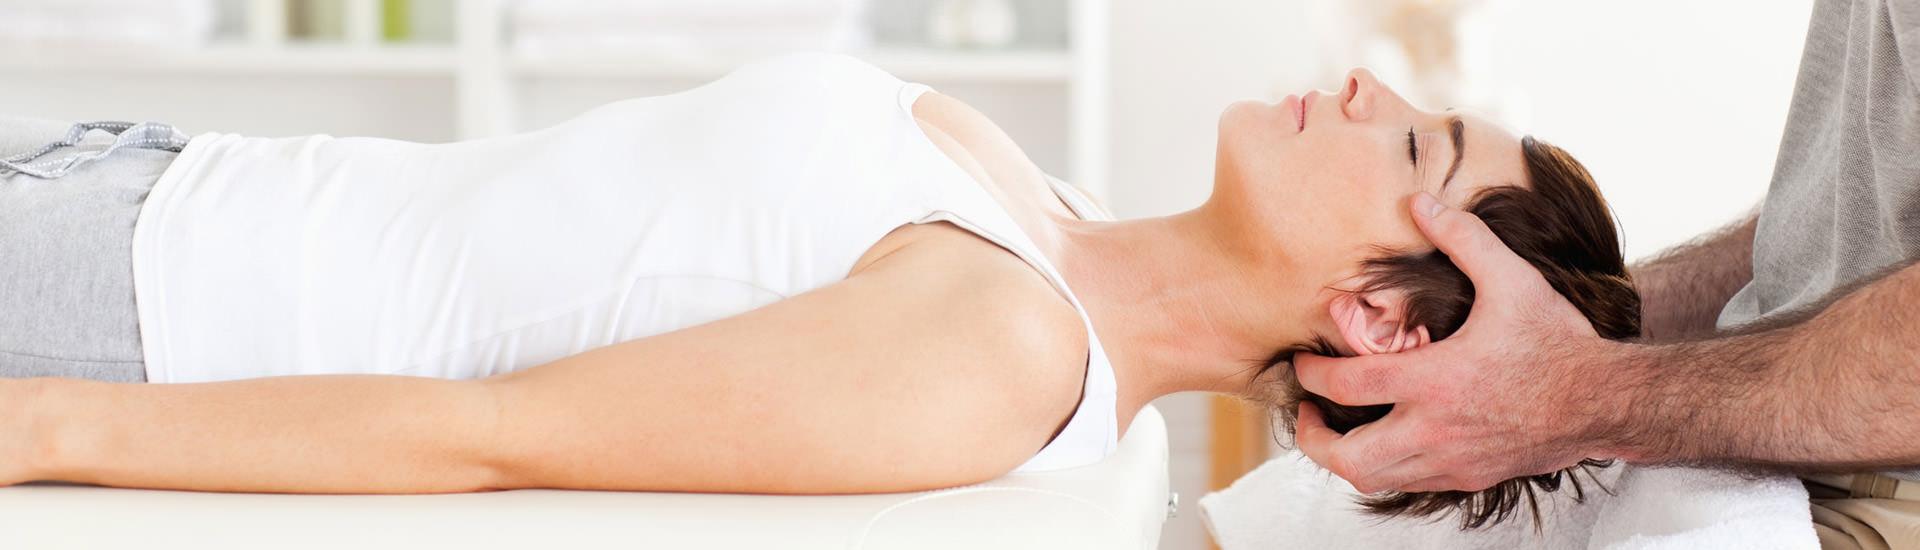 osteopatia-presso-sphaera